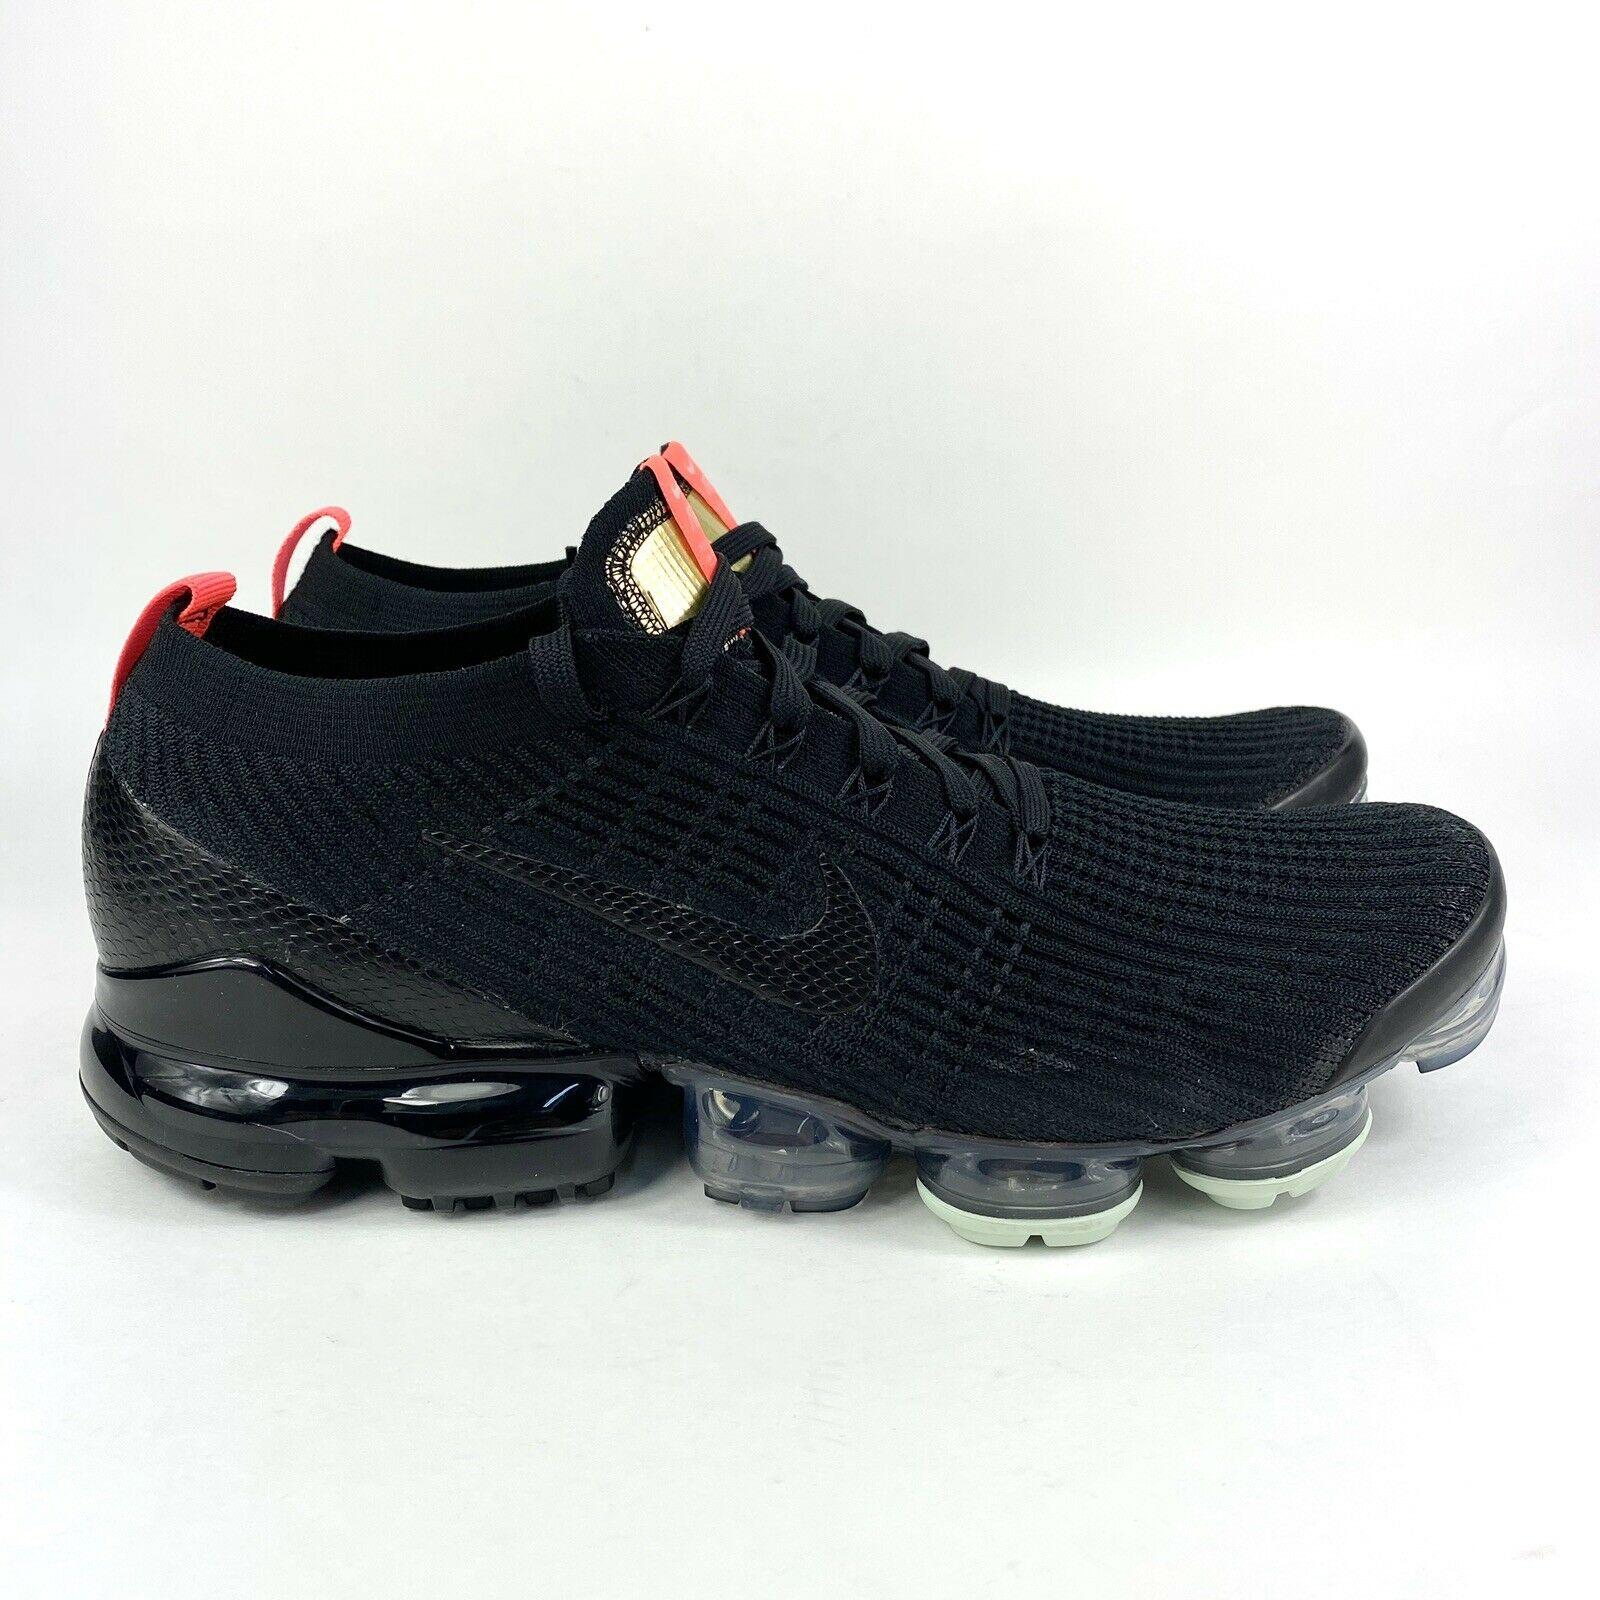 Nike Air VaporMax Flyknit 3 Black Snakeskin